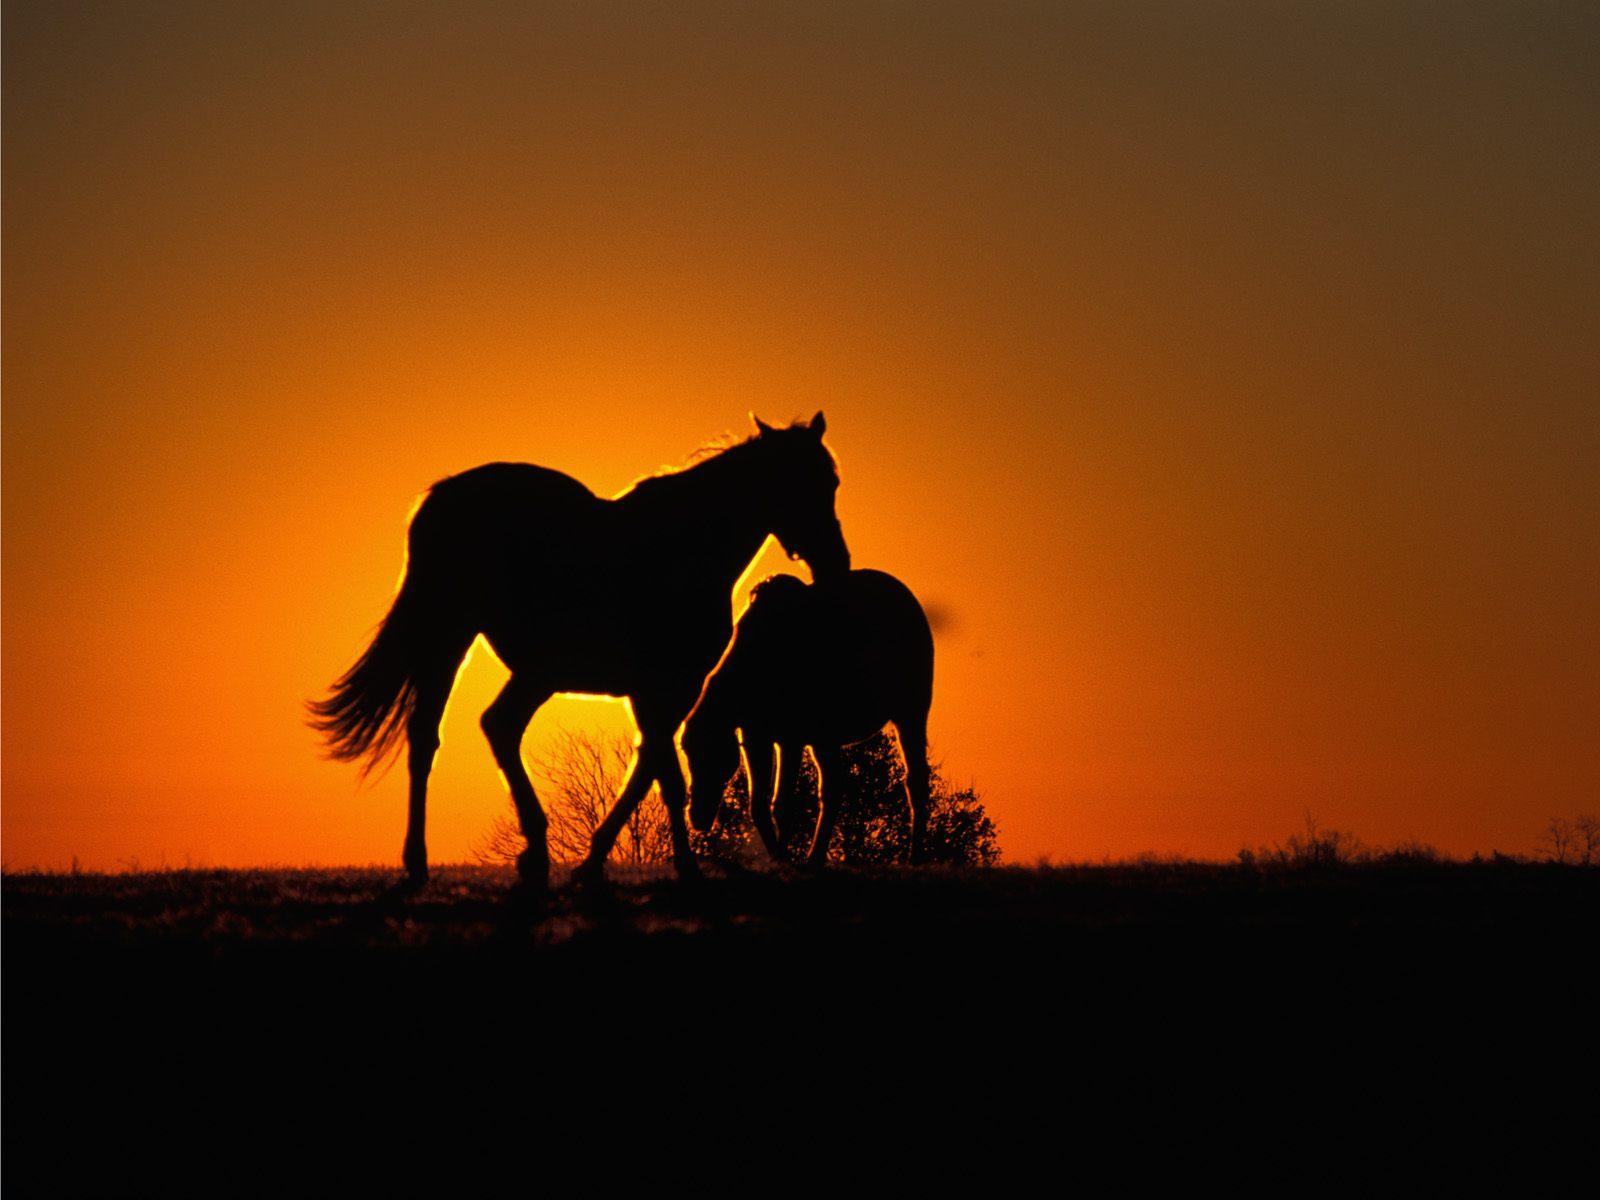 بالصور صور خيل , صور خيول جميلة 4344 10